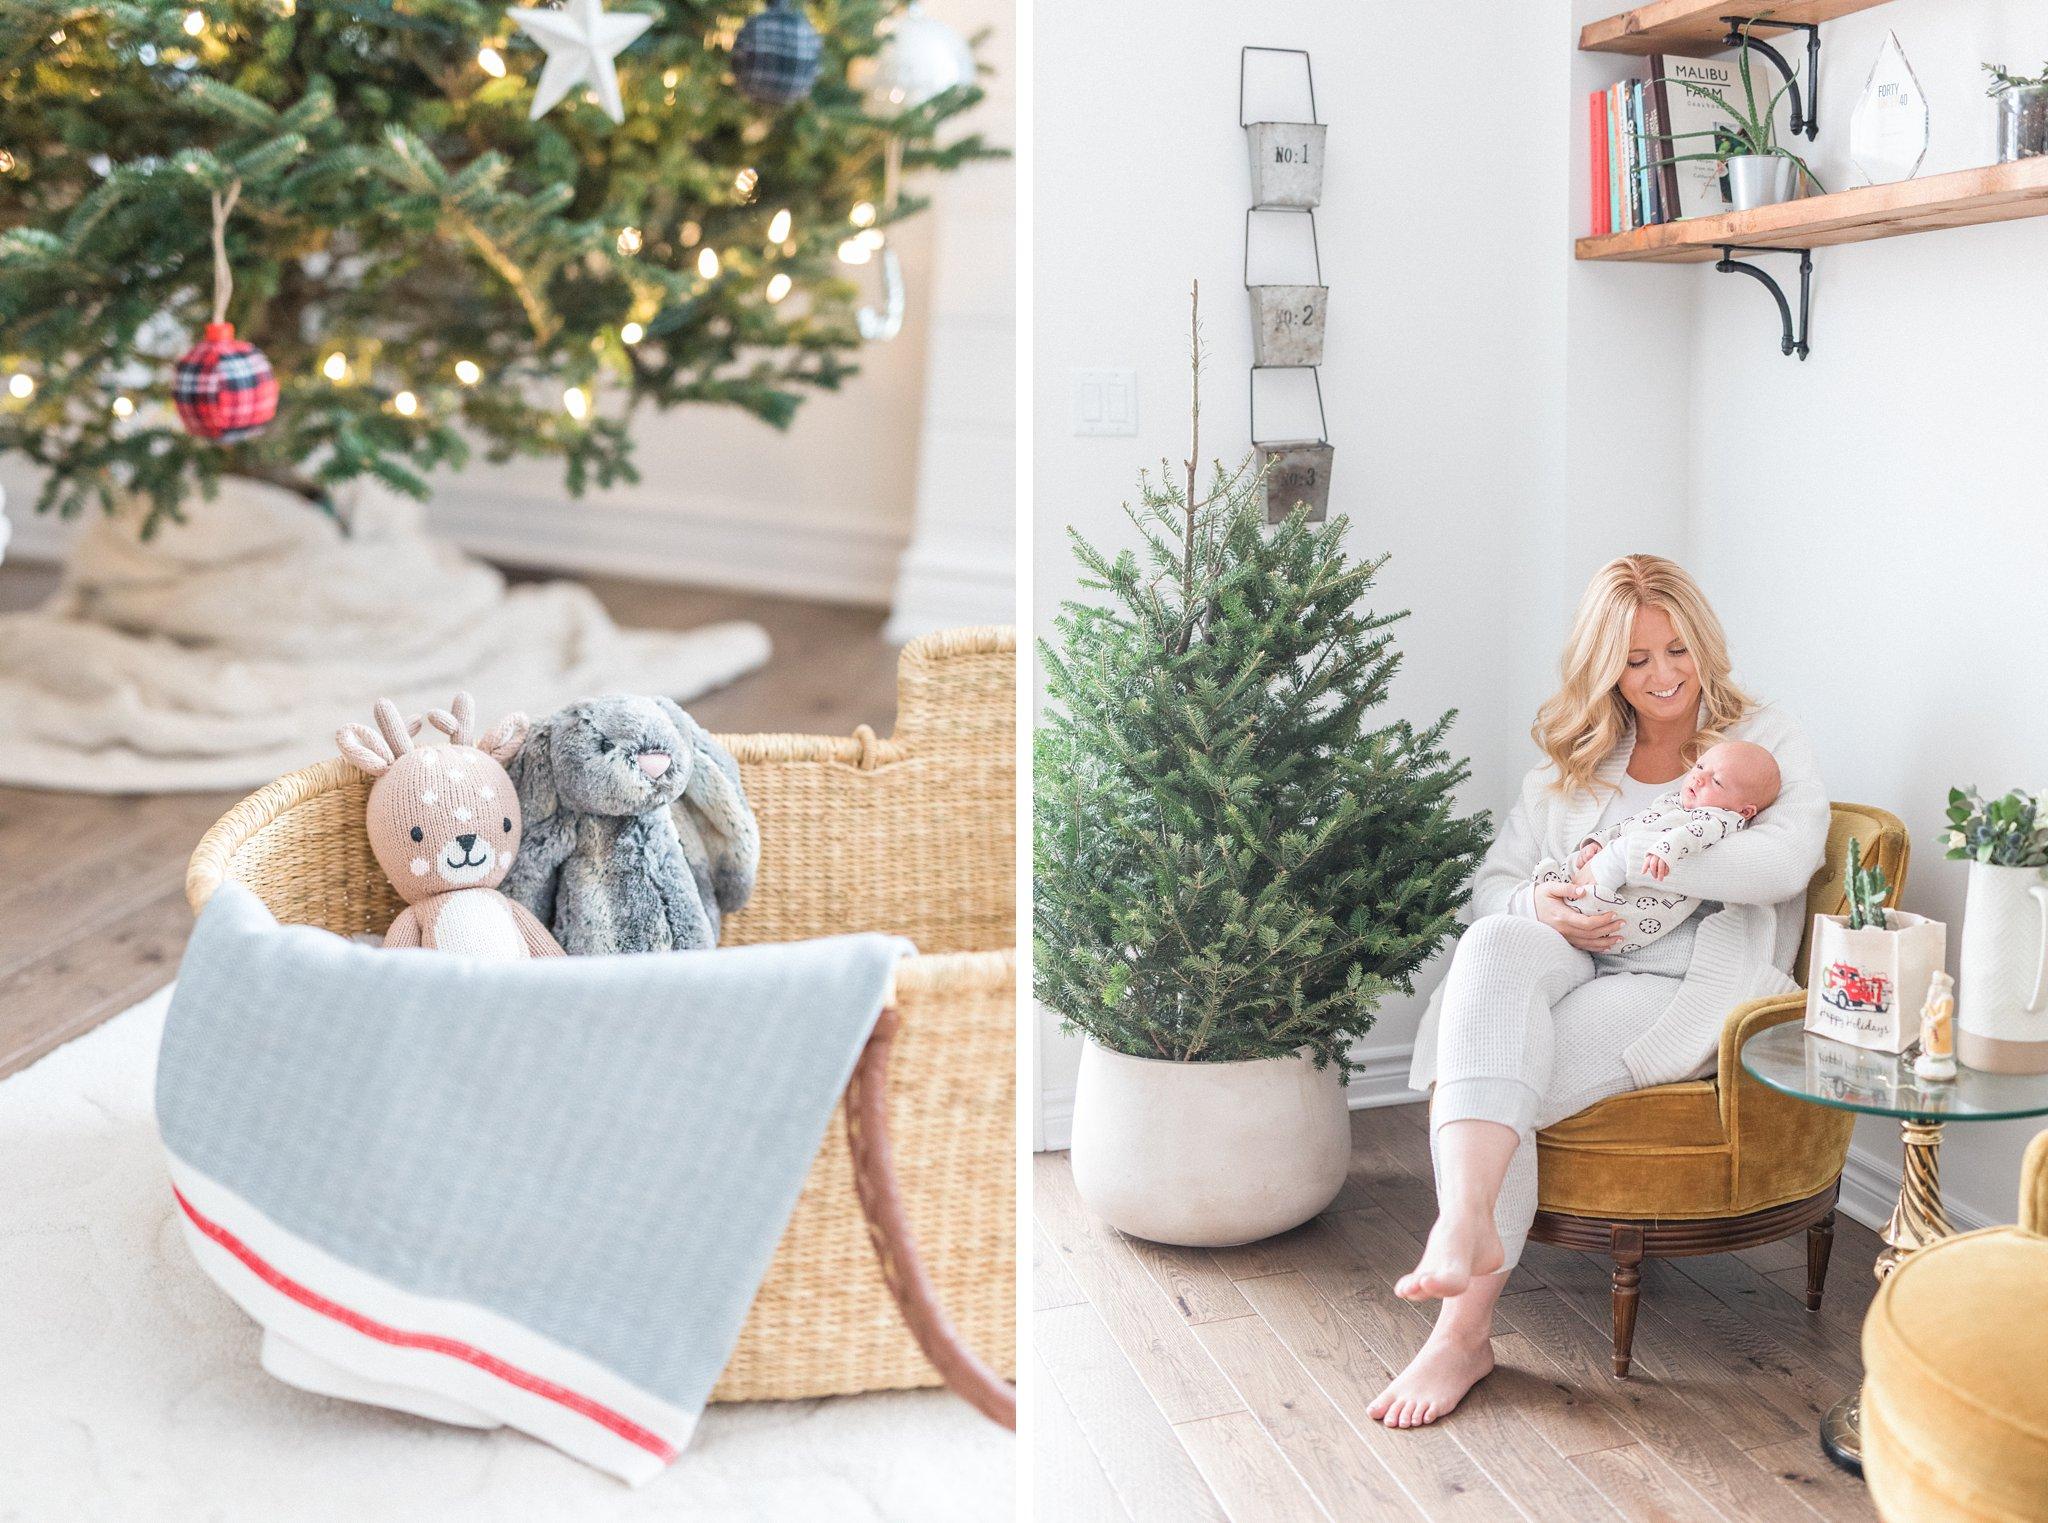 Moses basket, Festive Newborn Lifestyle Photos During the Christmas Holidays